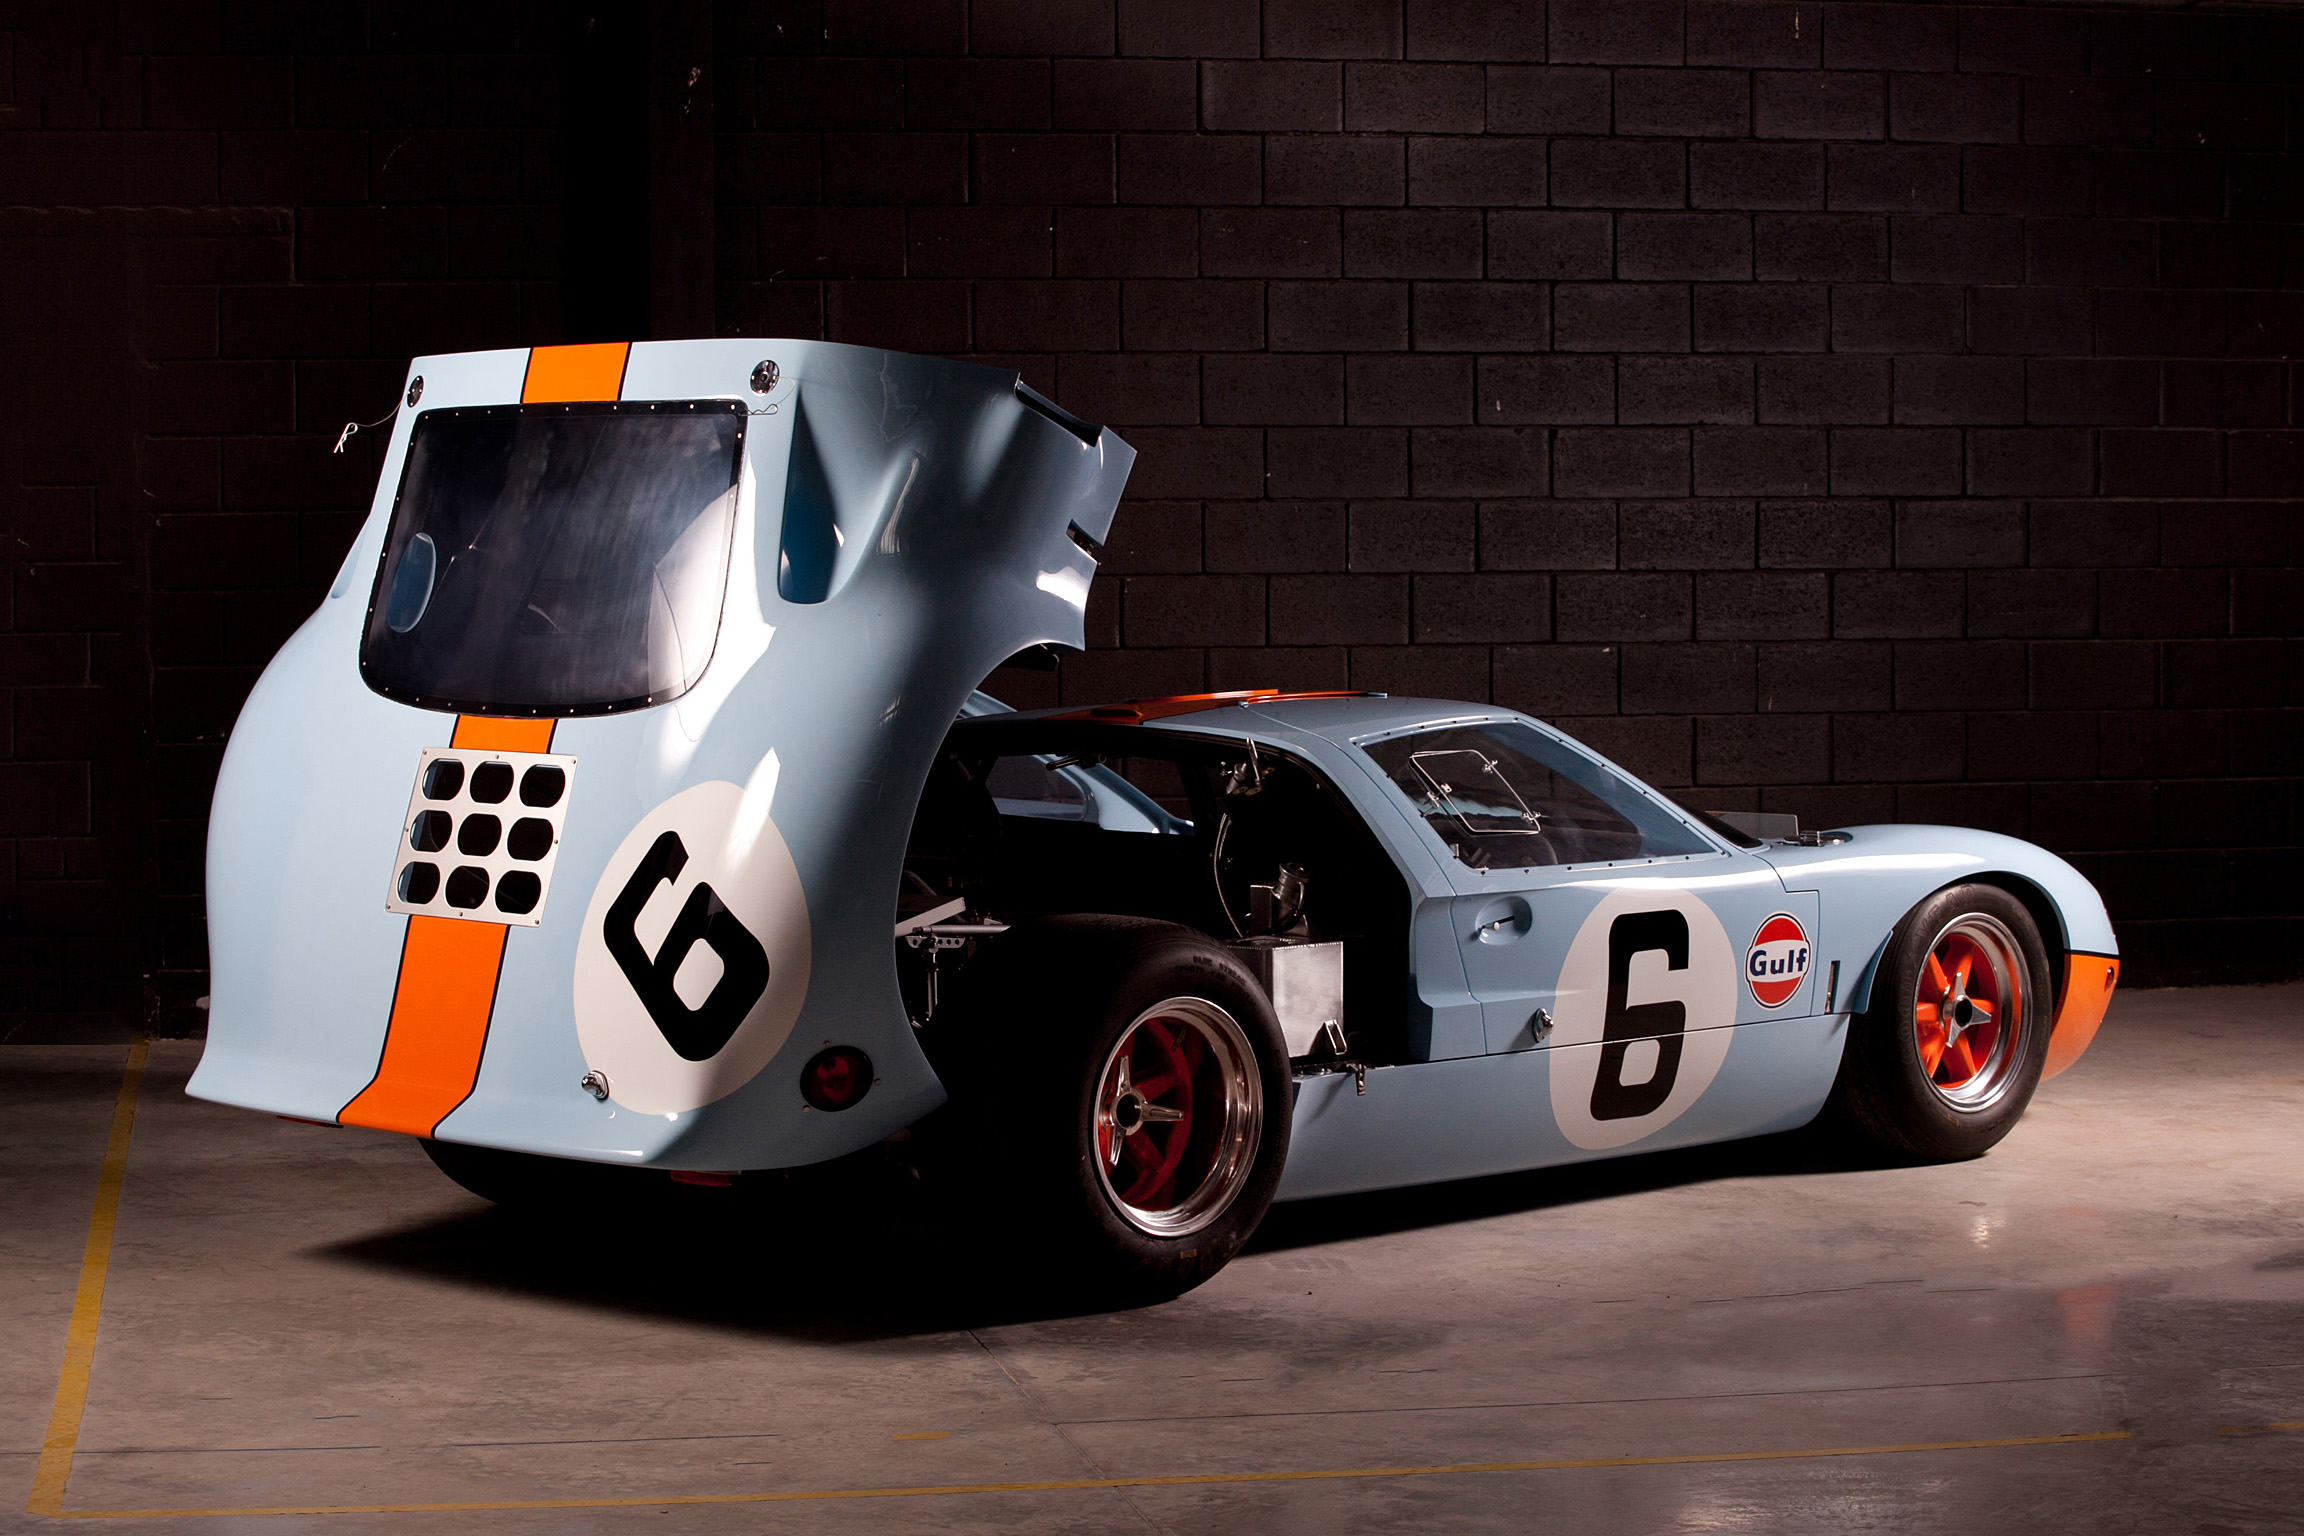 Superformance - GT40 MKI 50th Anniversary